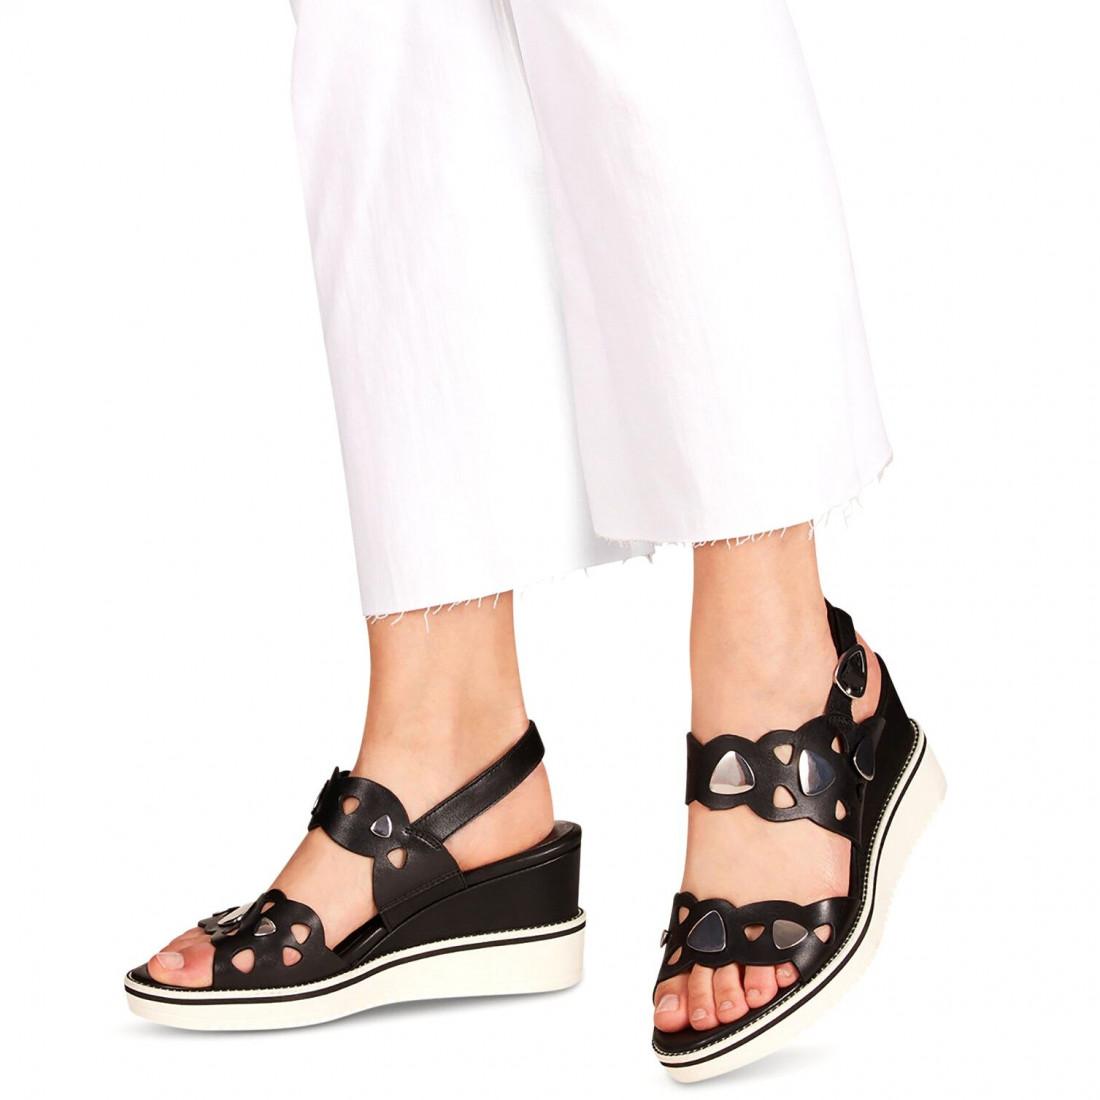 sandals woman tamaris 1 1 28053 34001 7207